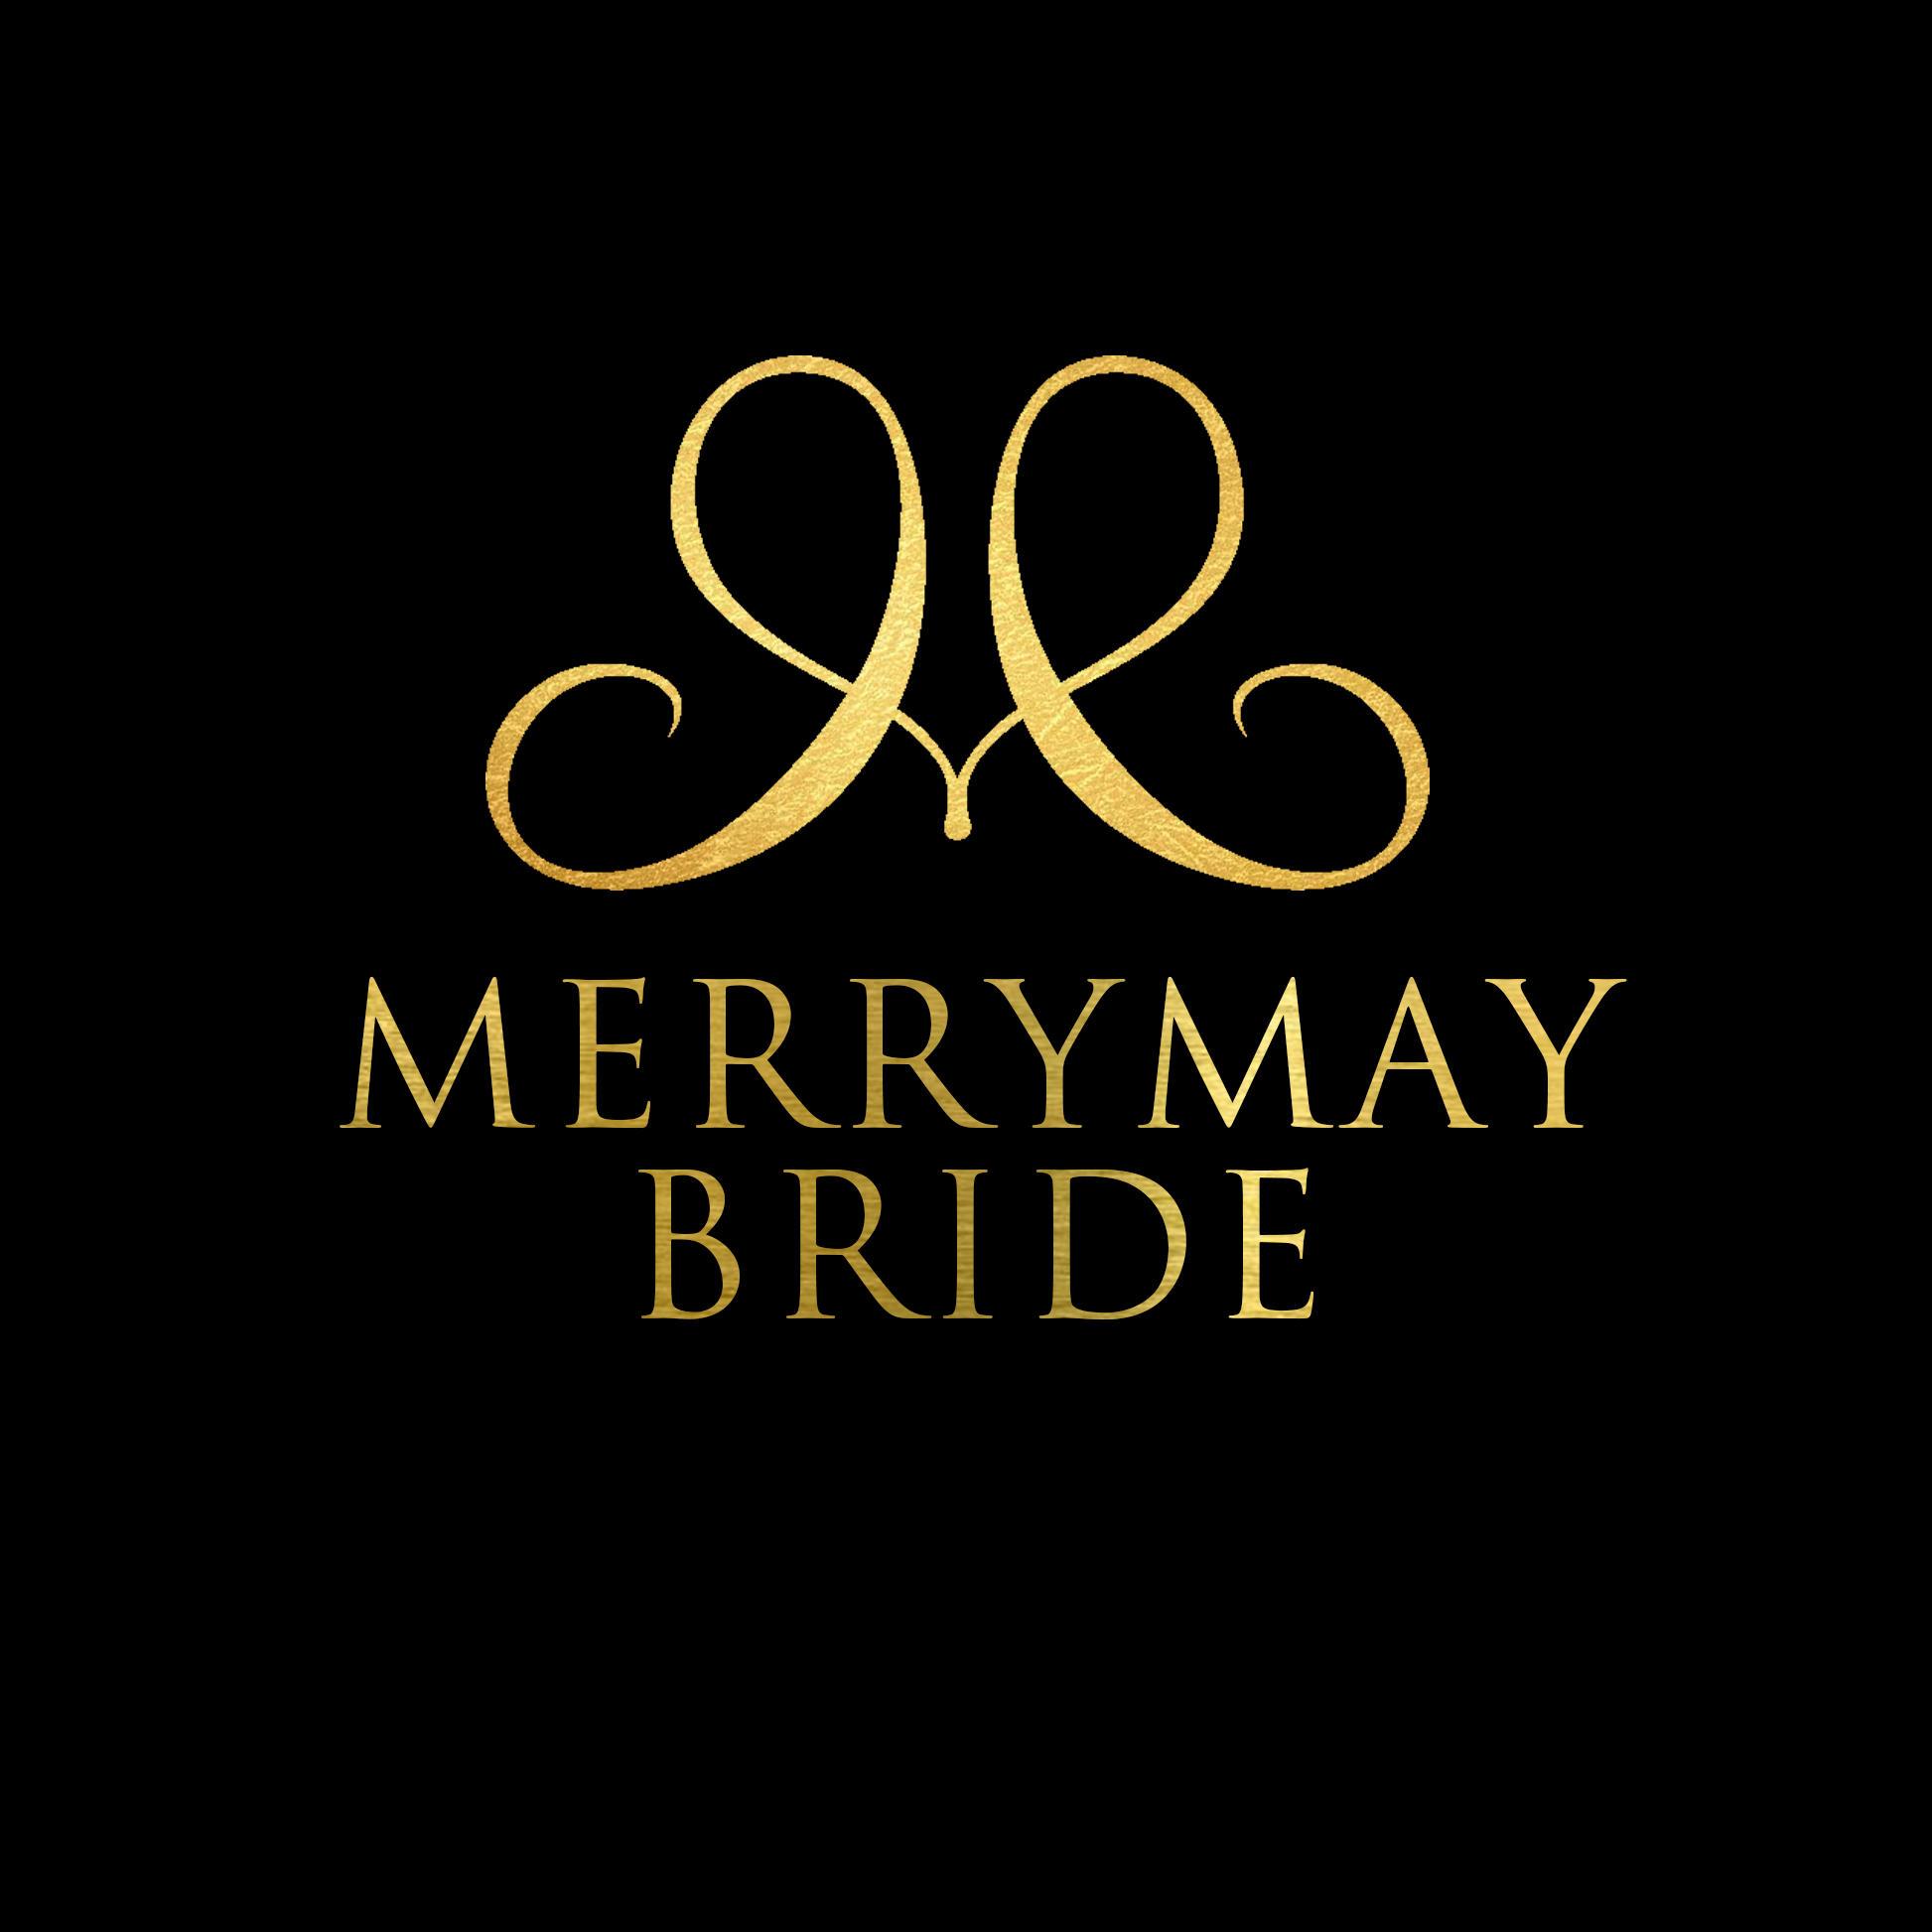 MERRYMAYBRIDE 栀夏婚纱